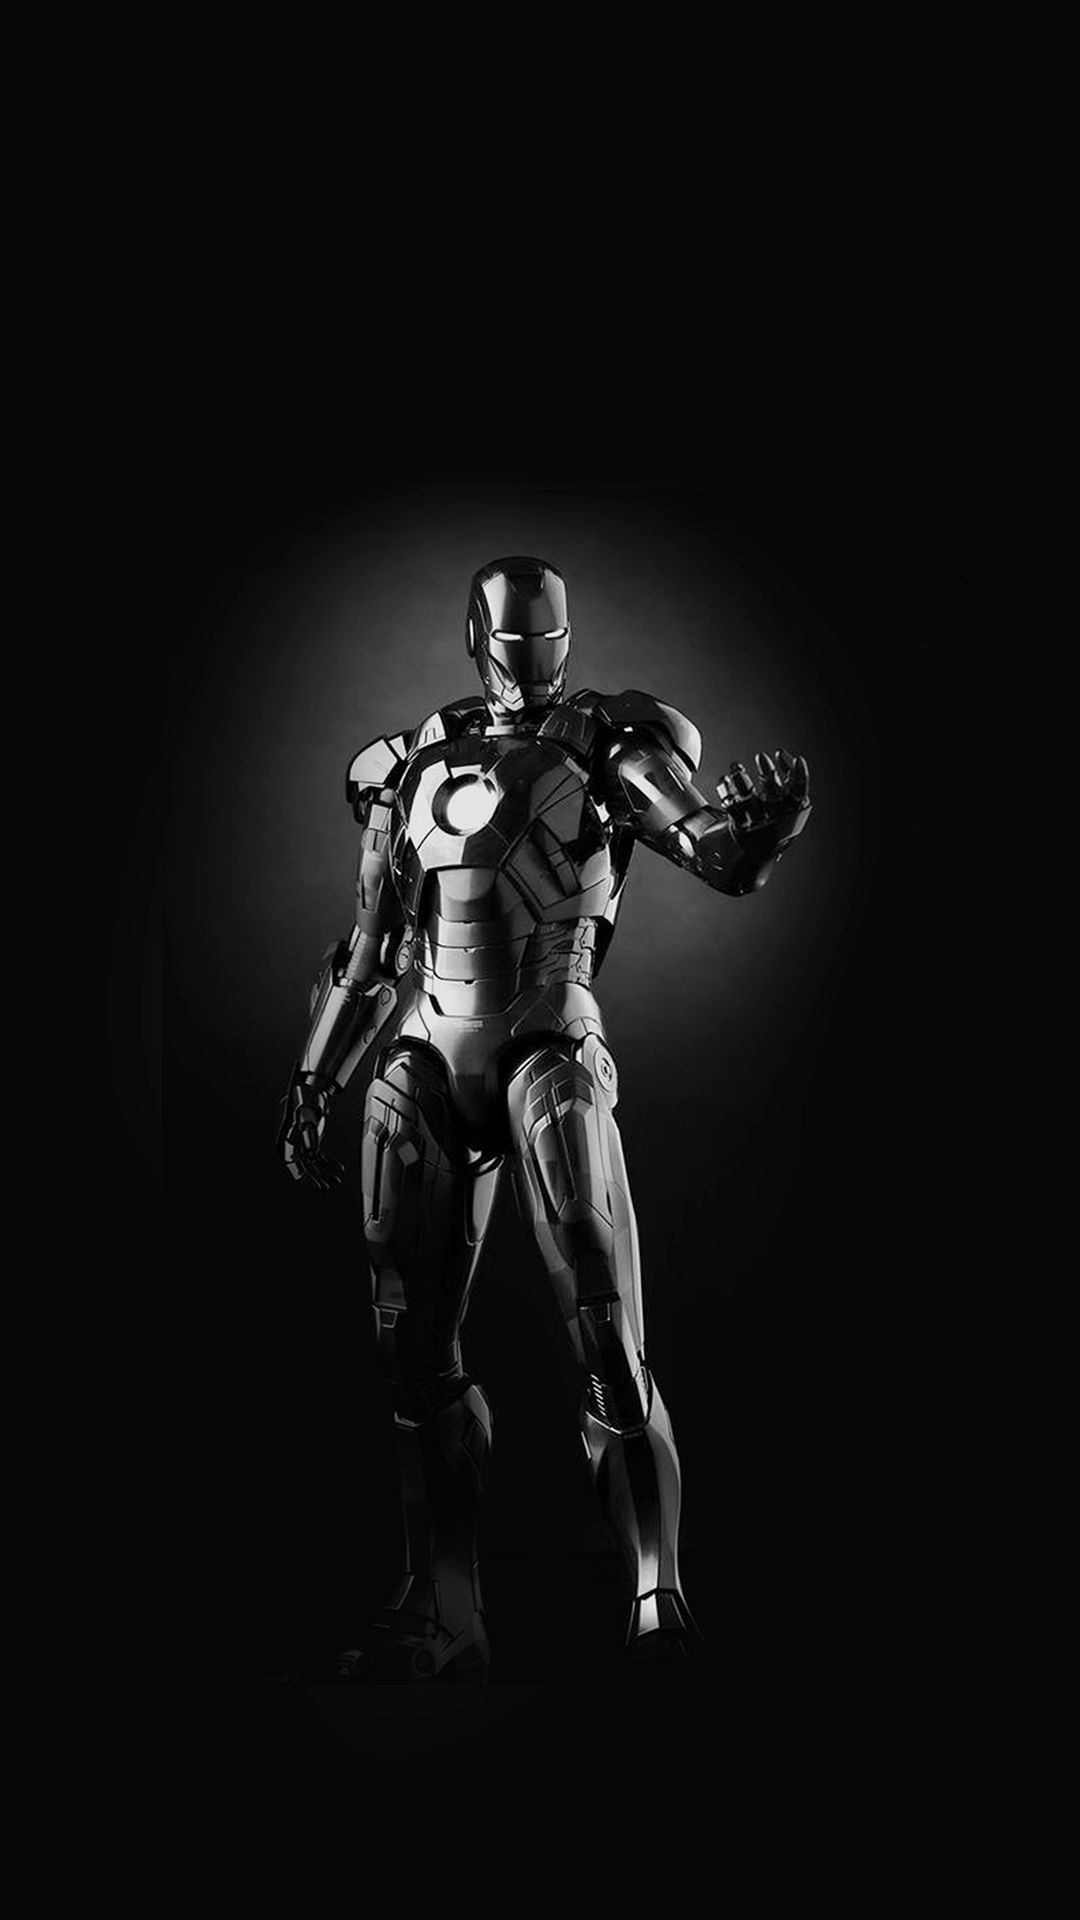 Wallpaper iphone avengers - Ironman Dark Figure Hero Art Avengers Bw Iphone 6 Plus Wallpaper